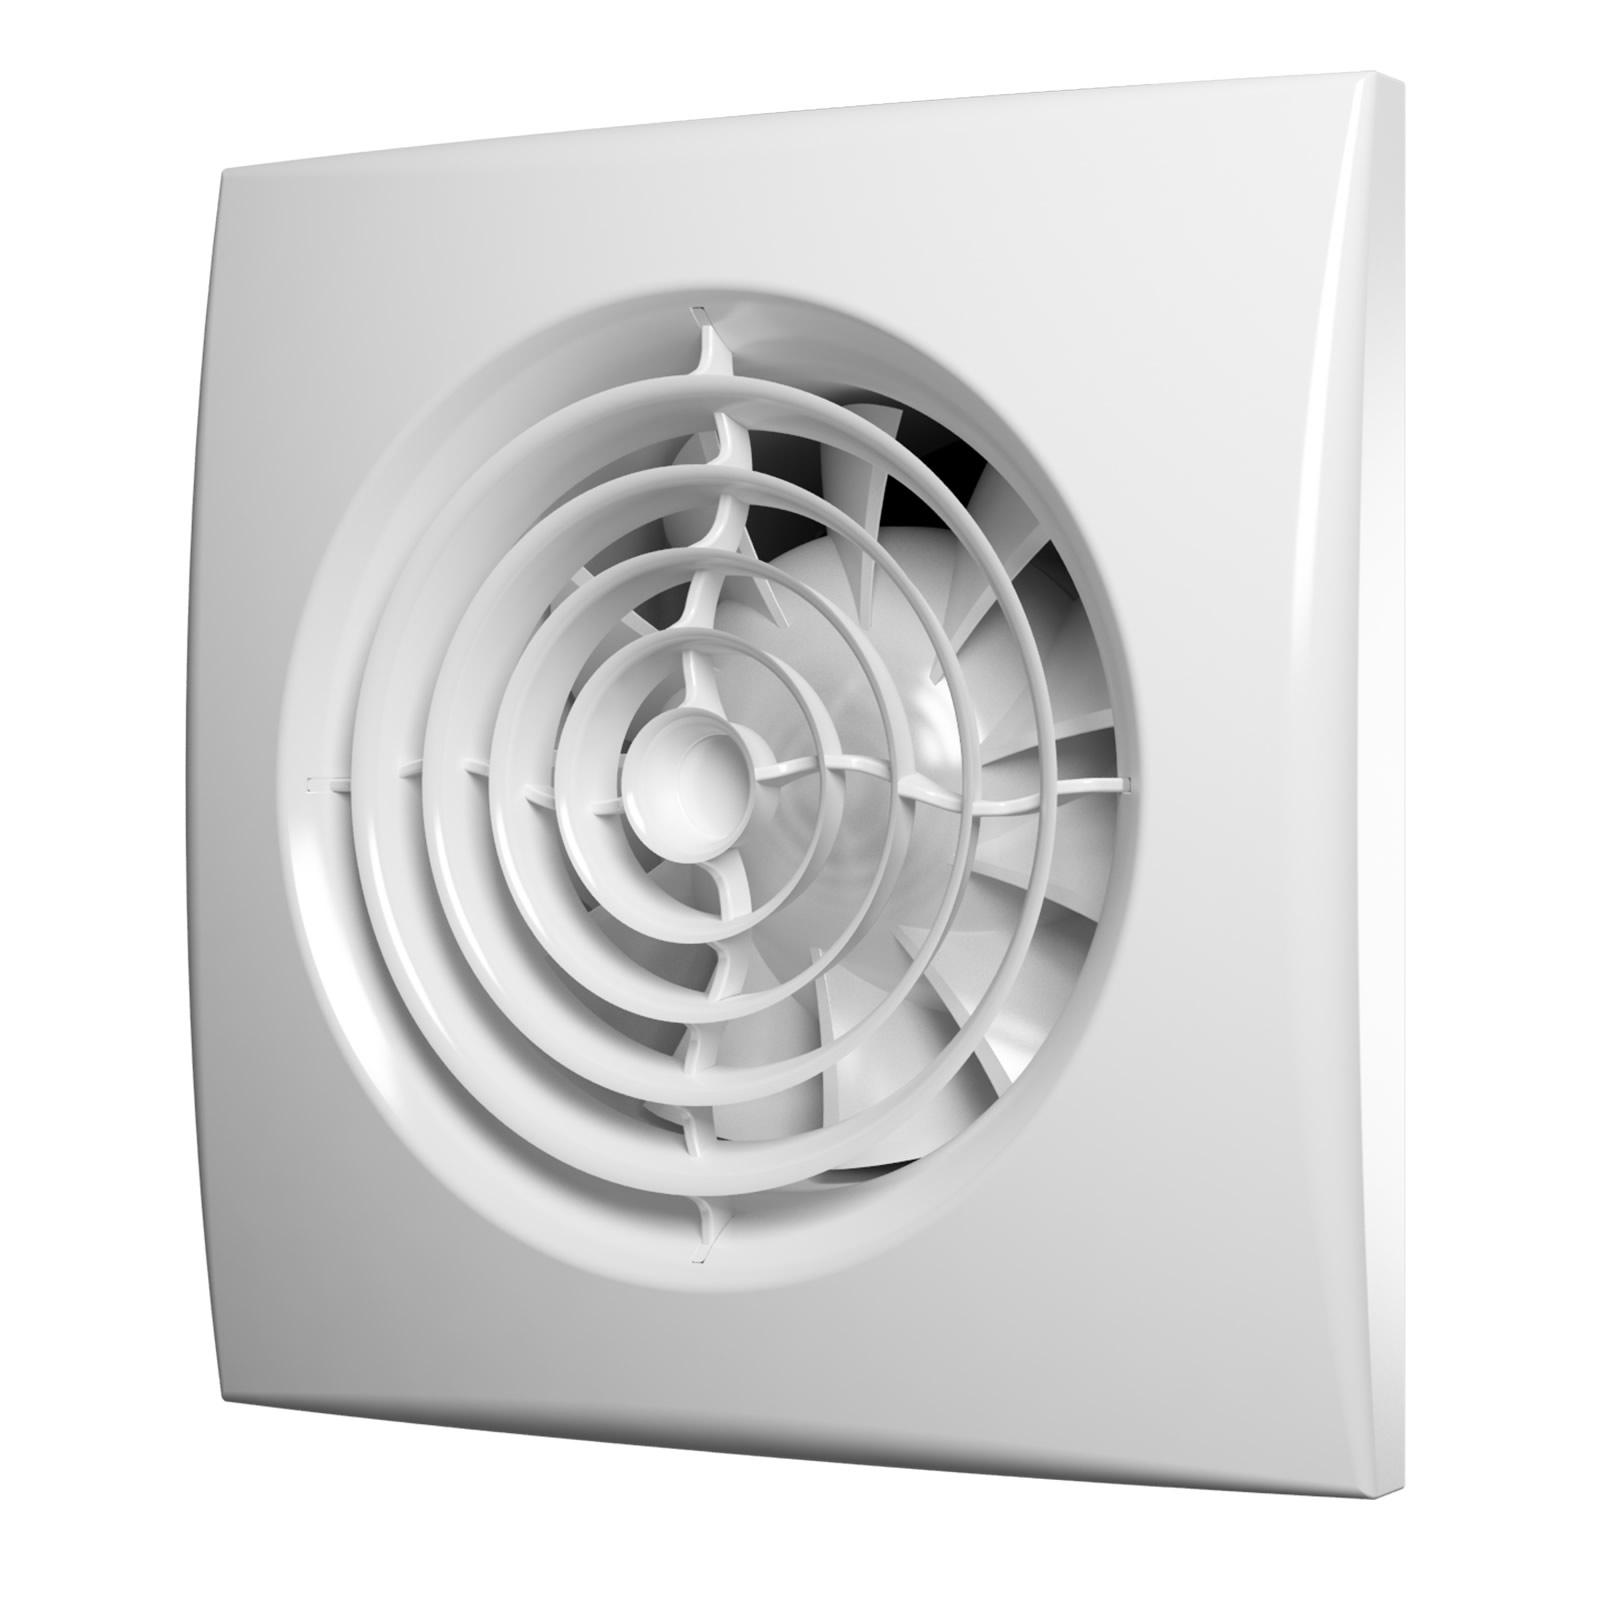 Вентилятор Diciti Aura 4c mrh